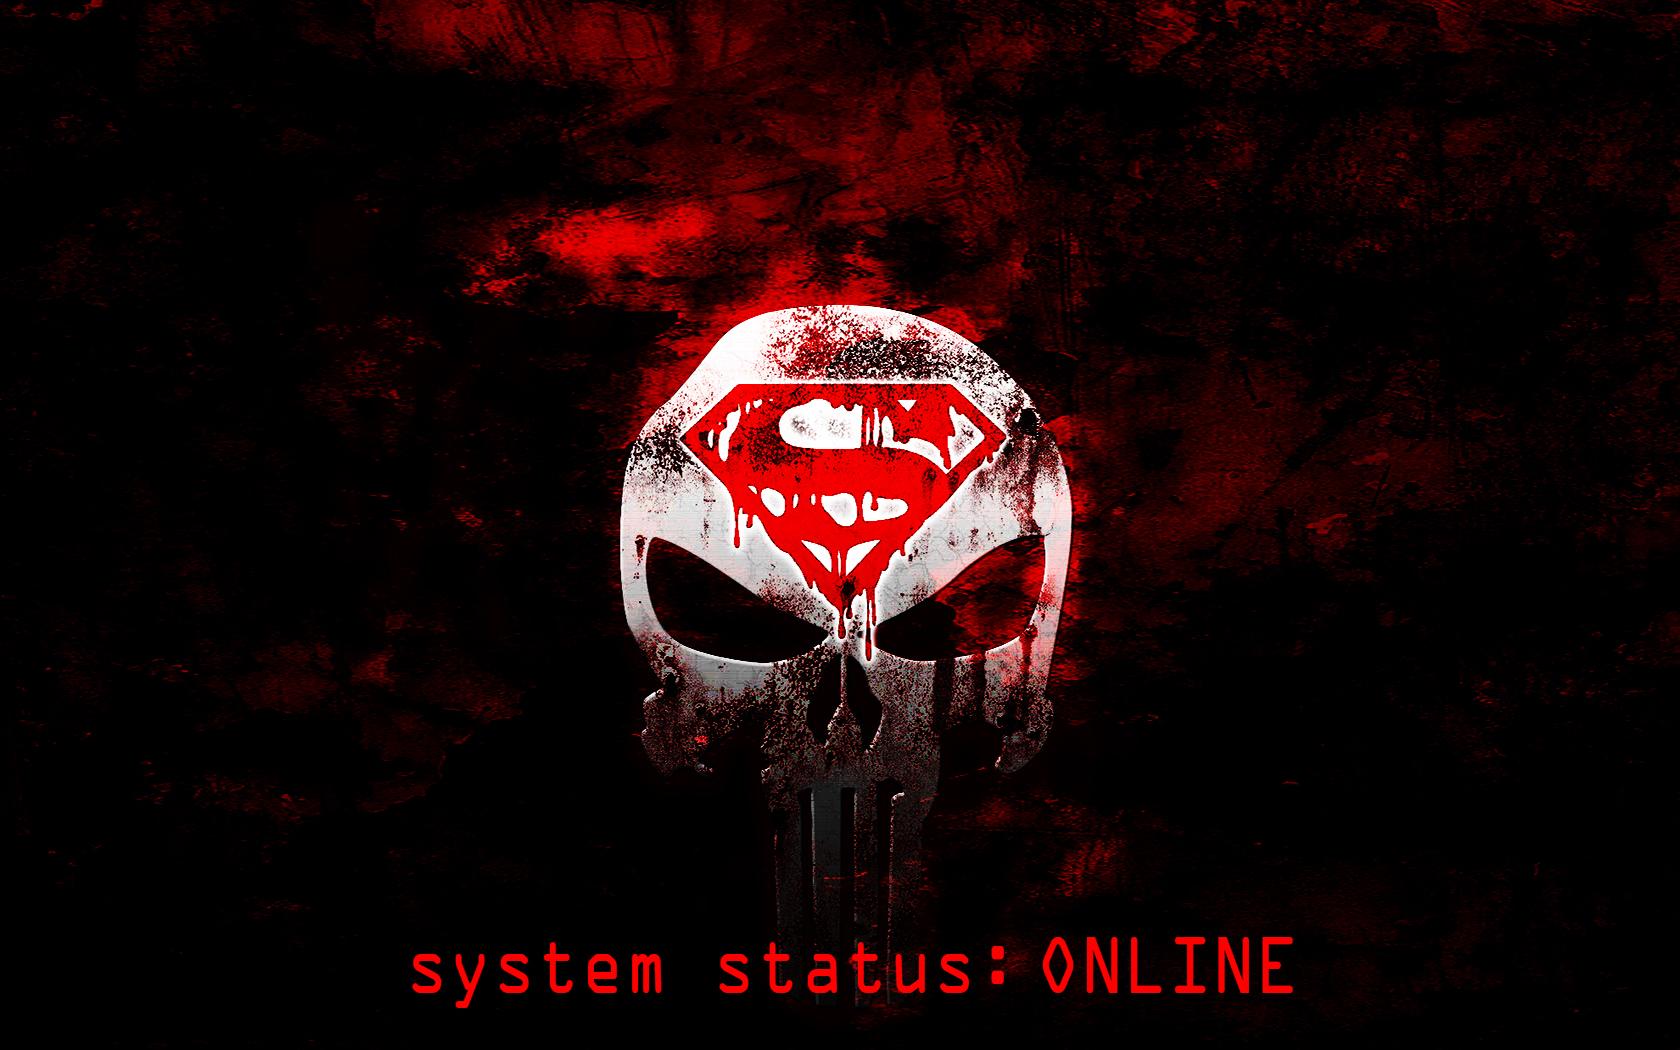 Superman/Punisher logo Wallpaper ONLINE by s1nwithm3 on DeviantArt